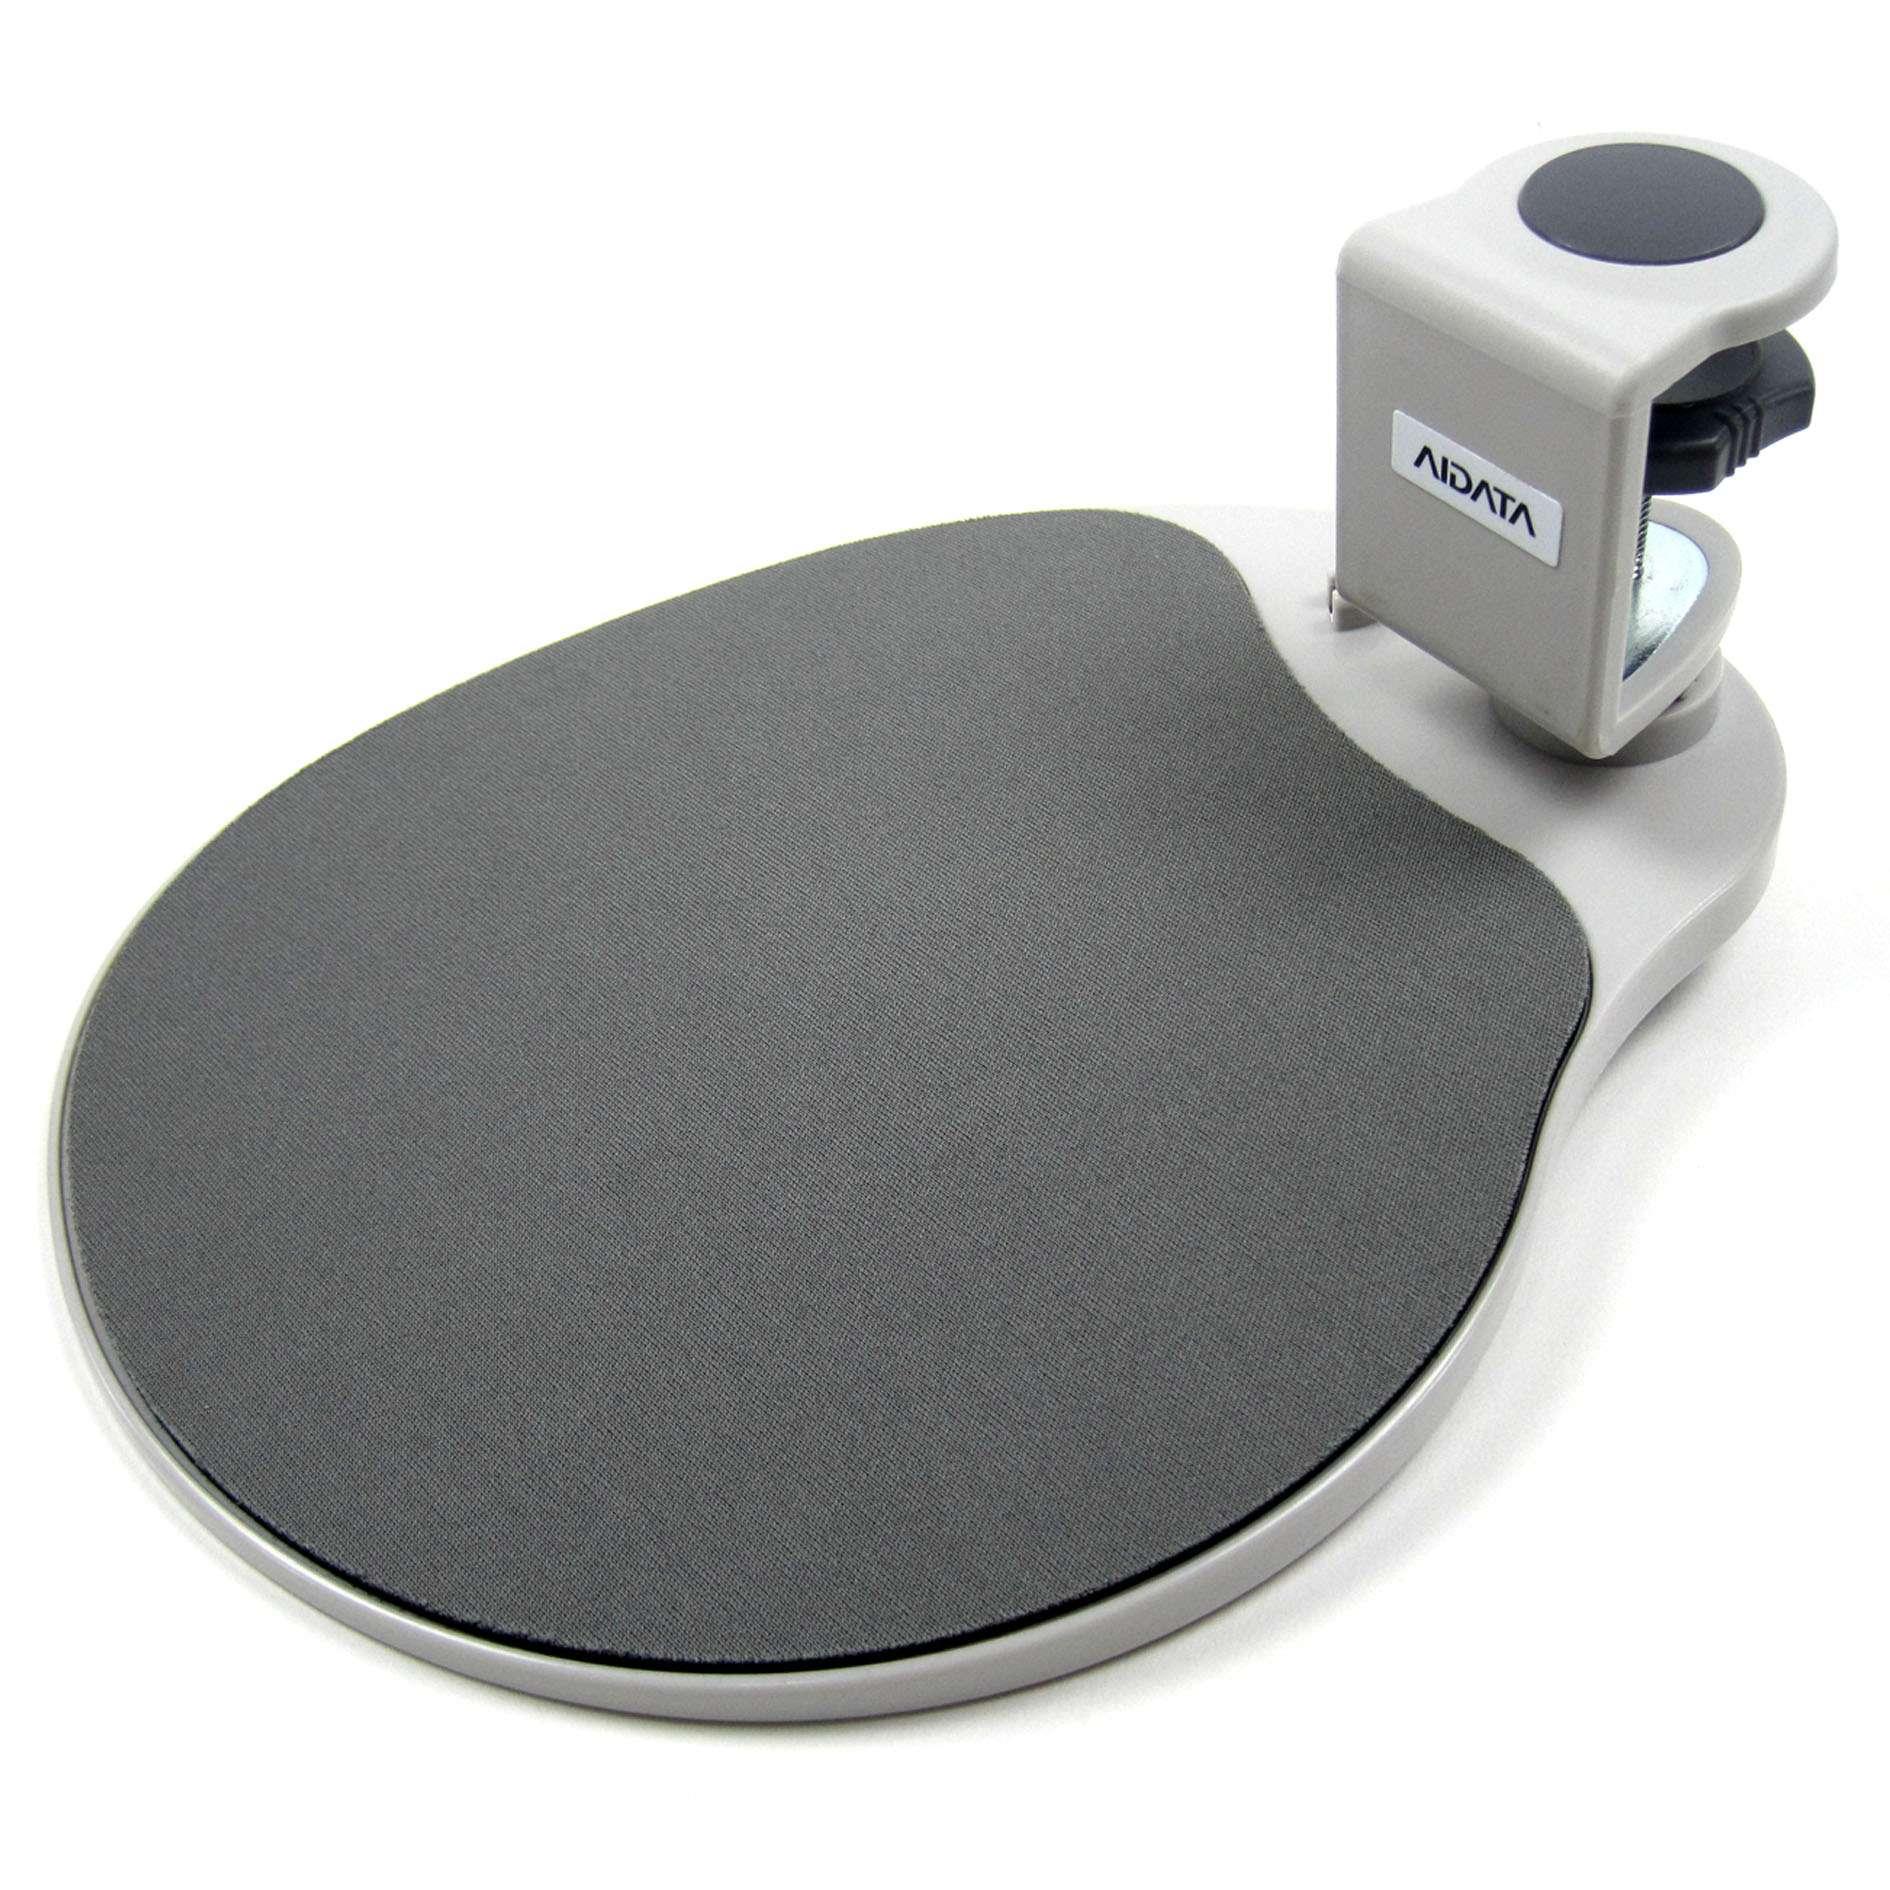 New Aidata Under Desk Mouse Platform Ergonomic Mouse Pad